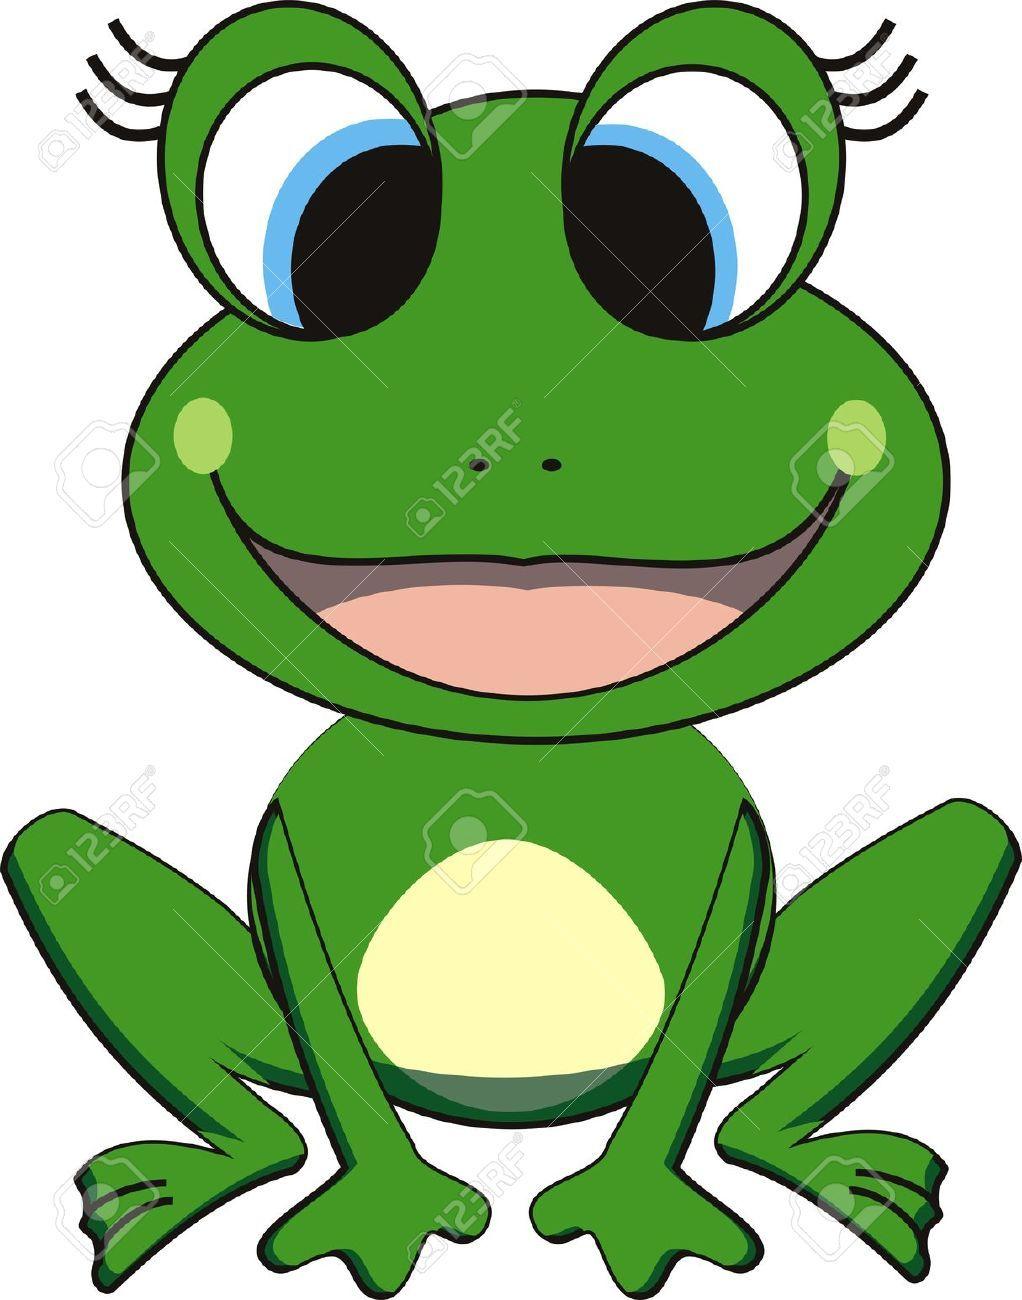 Vector Illustration Of Happy Frog Cliparts, Vector, Và ...